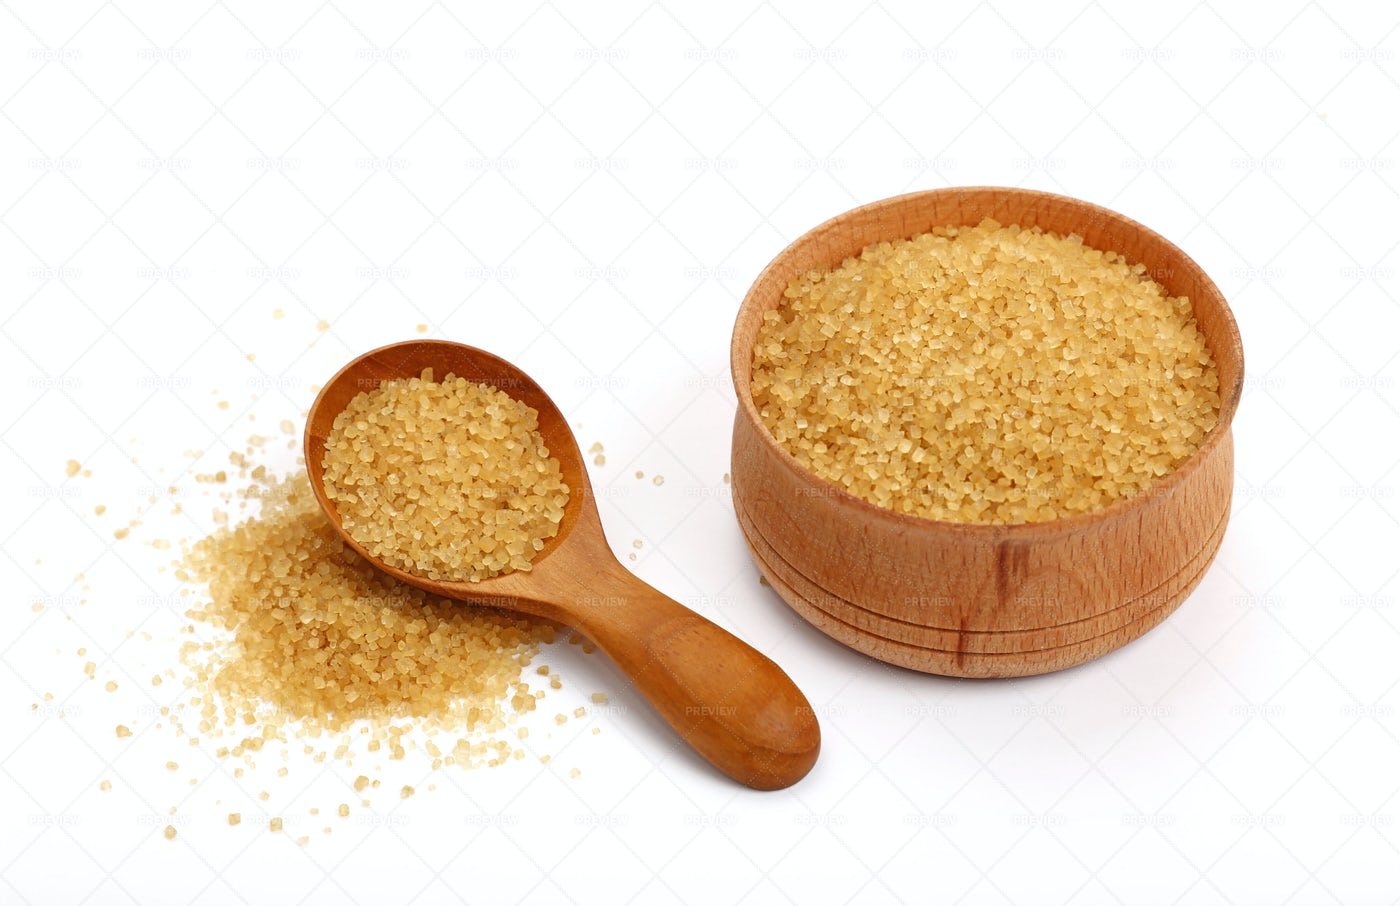 Tasty Brown Sugar: Stock Photos